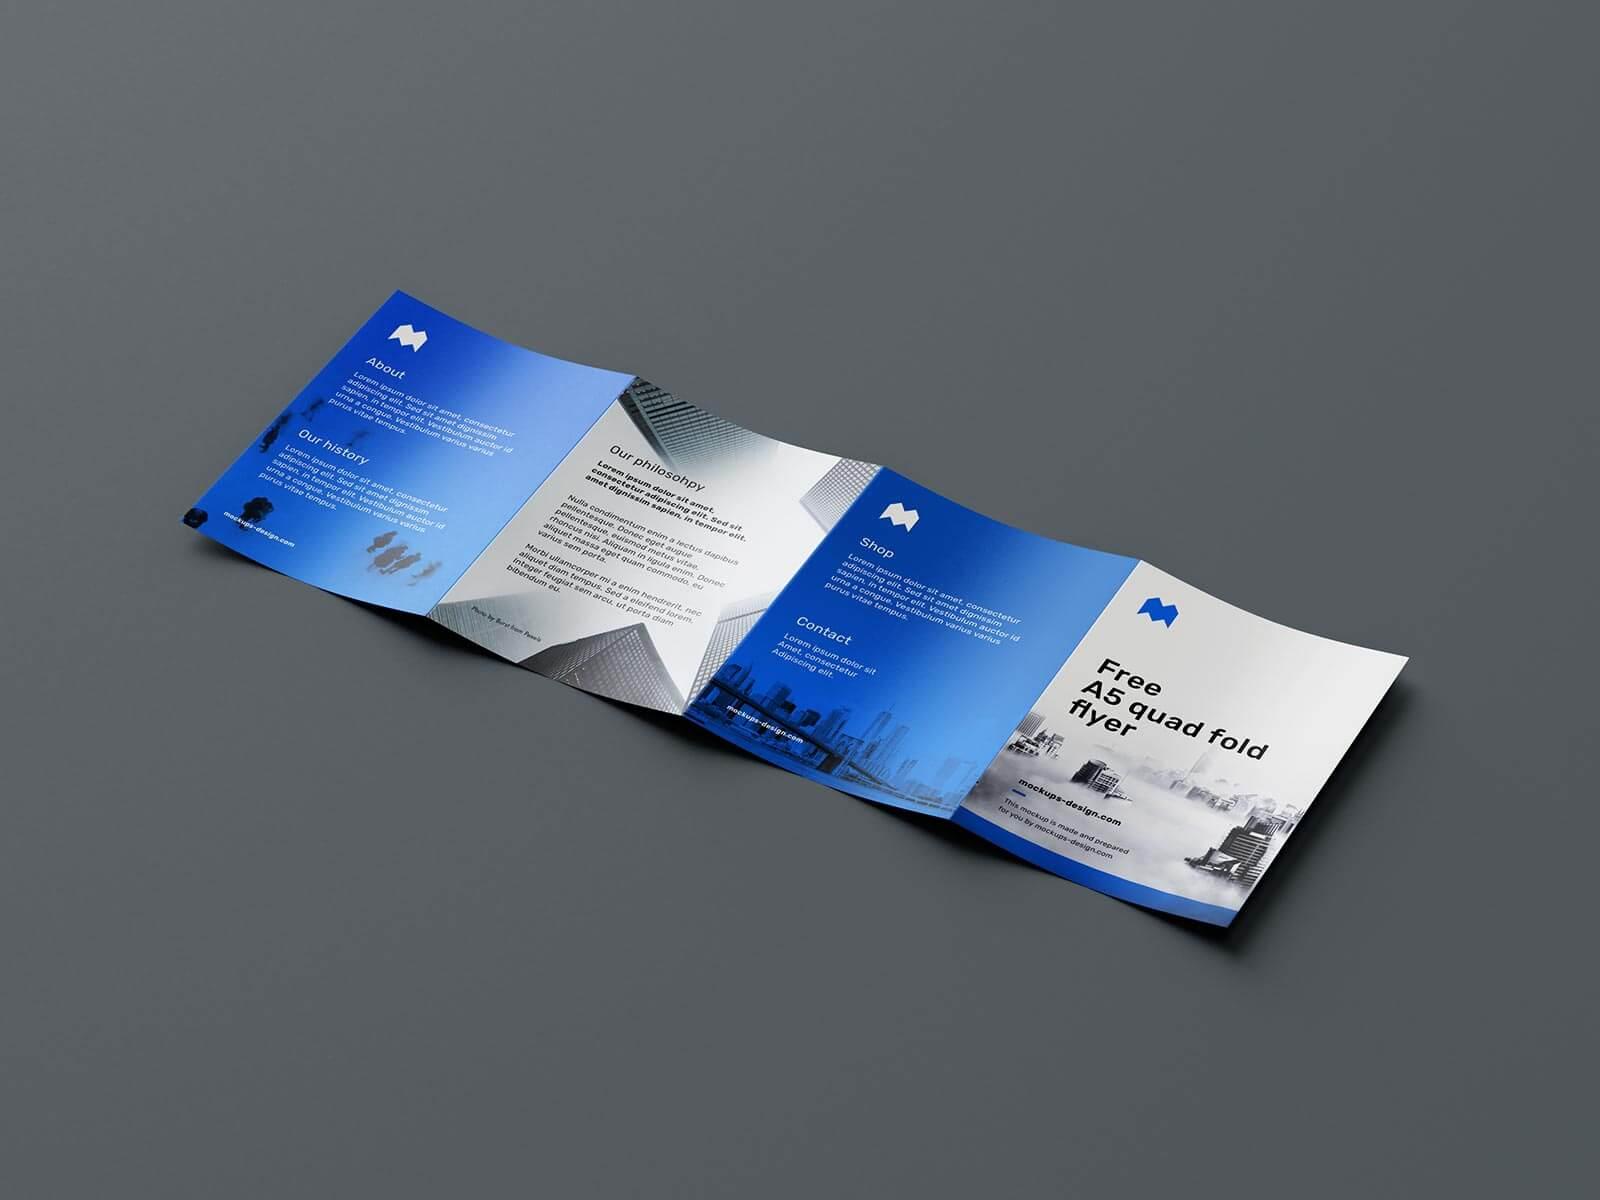 Free 4-Fold Quad Fold A5 Brochure Mockup PSD